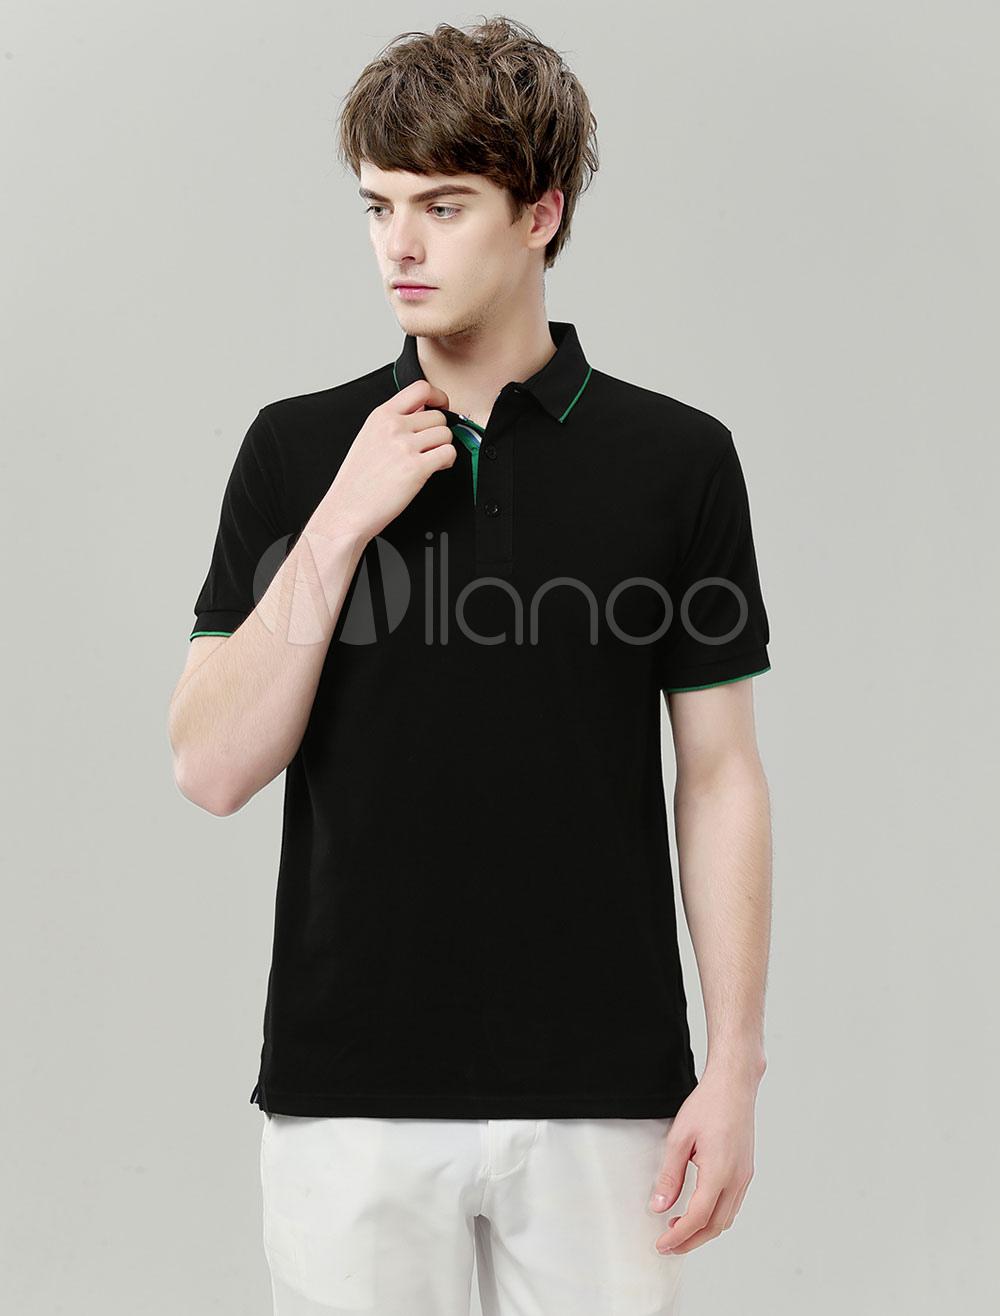 Buy Black Polo Shirt Cotton Piping Regular Fit Short Sleeve Golf Shirt Men T Shirt Casual for $17.99 in Milanoo store